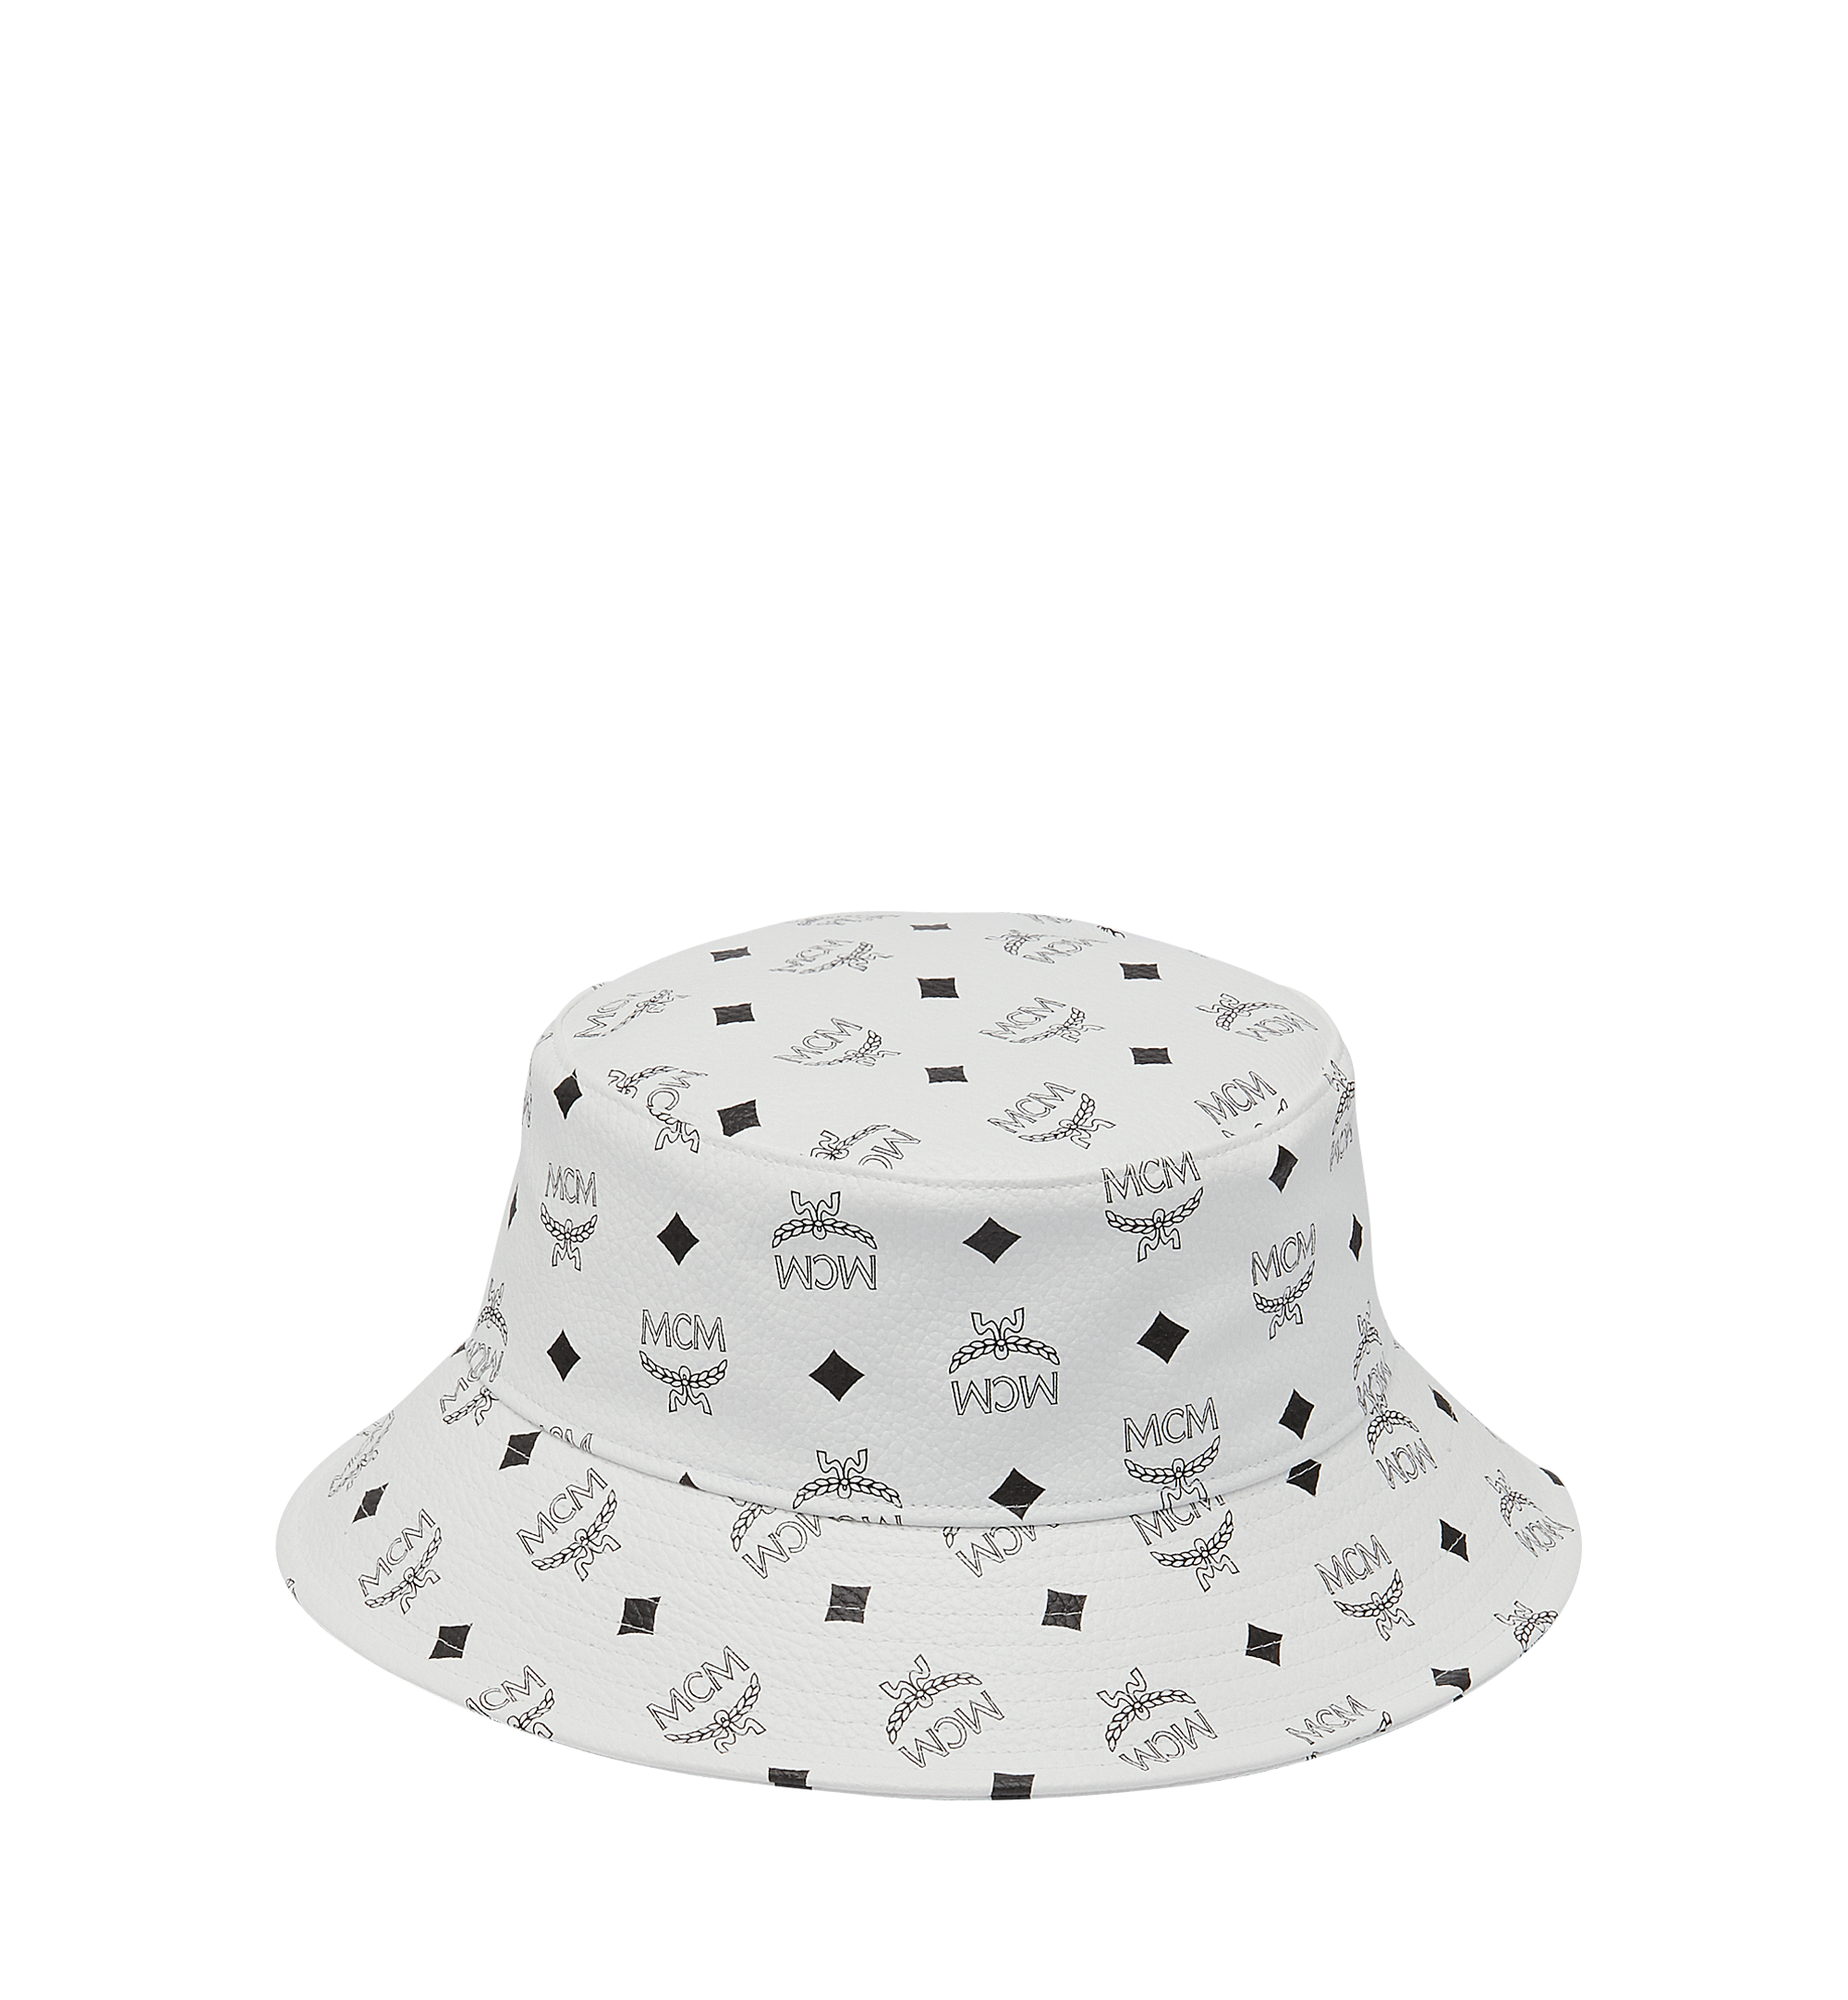 Mcm Bucket Hat In Visetos In White Modesens Bucket Hat Hats Mcm